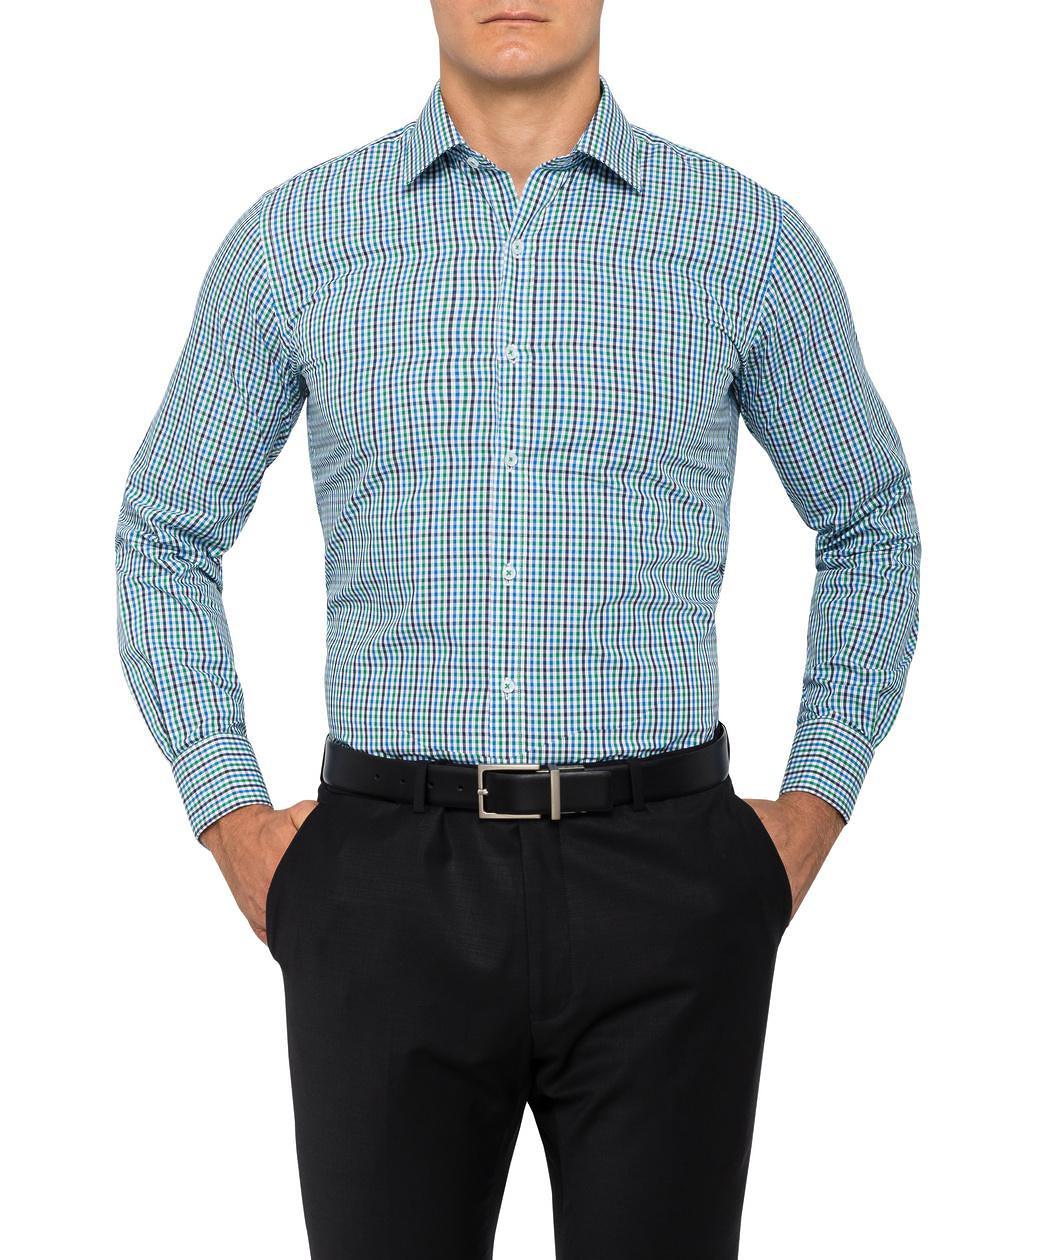 590097c2612 ... Mens European Fit Shirt Green Navy Check. Product Image · Image 1 ...